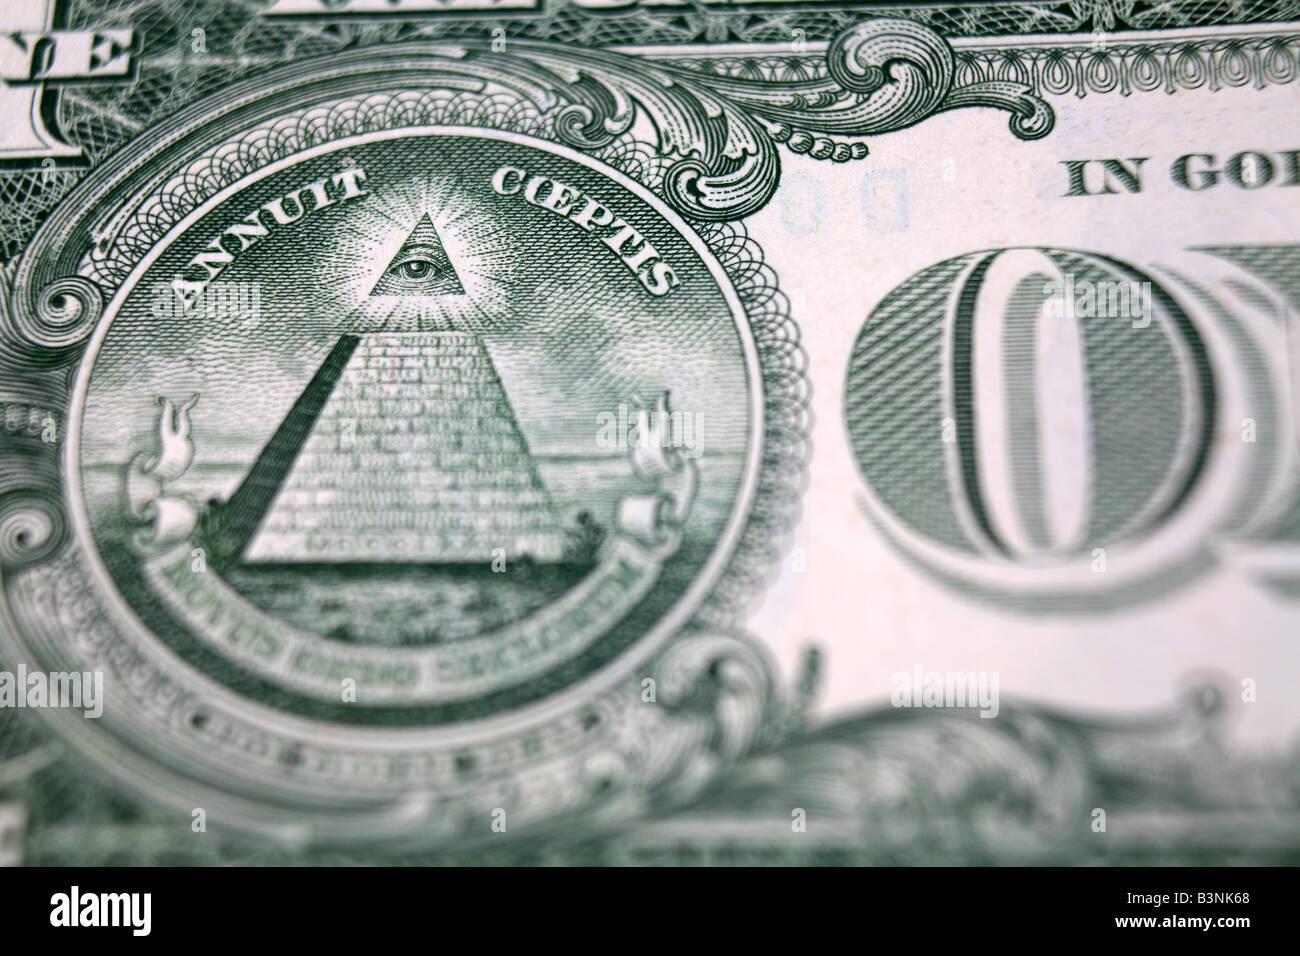 Triangle symbol pyramid green back bank note dollars from united triangle symbol pyramid green back bank note dollars from united states of america biocorpaavc